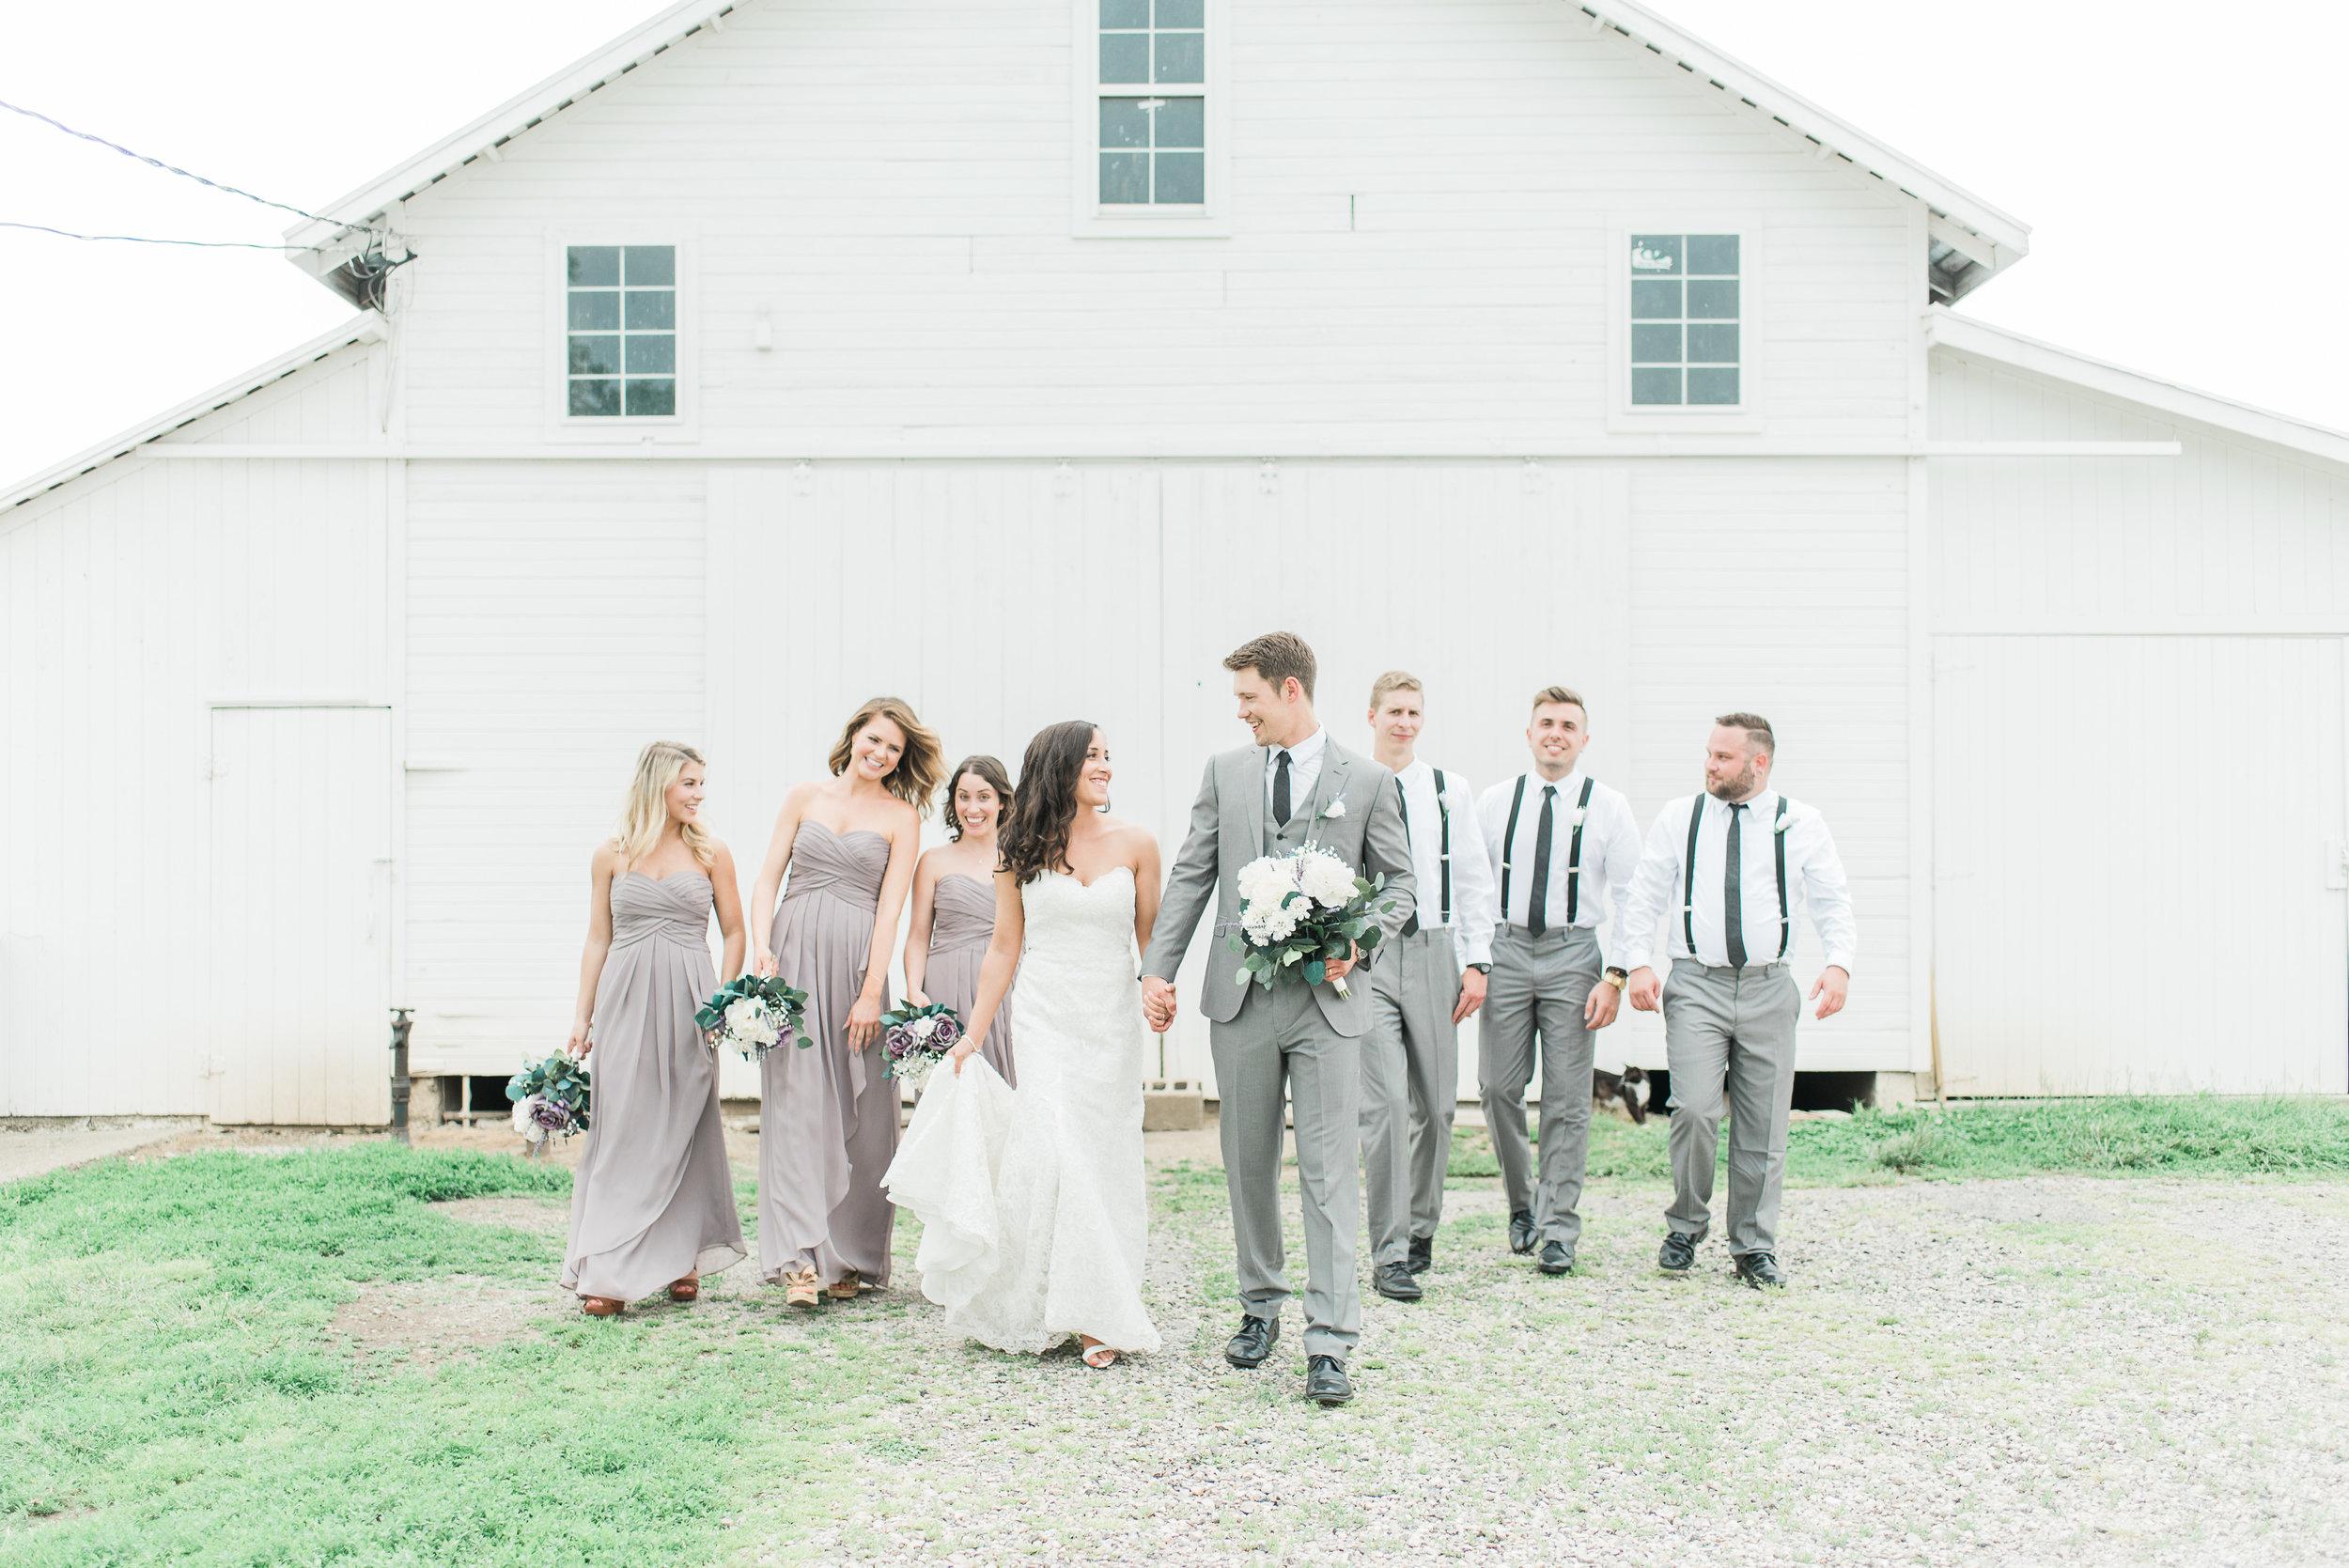 sarah-marcus-married-921 copy.jpg